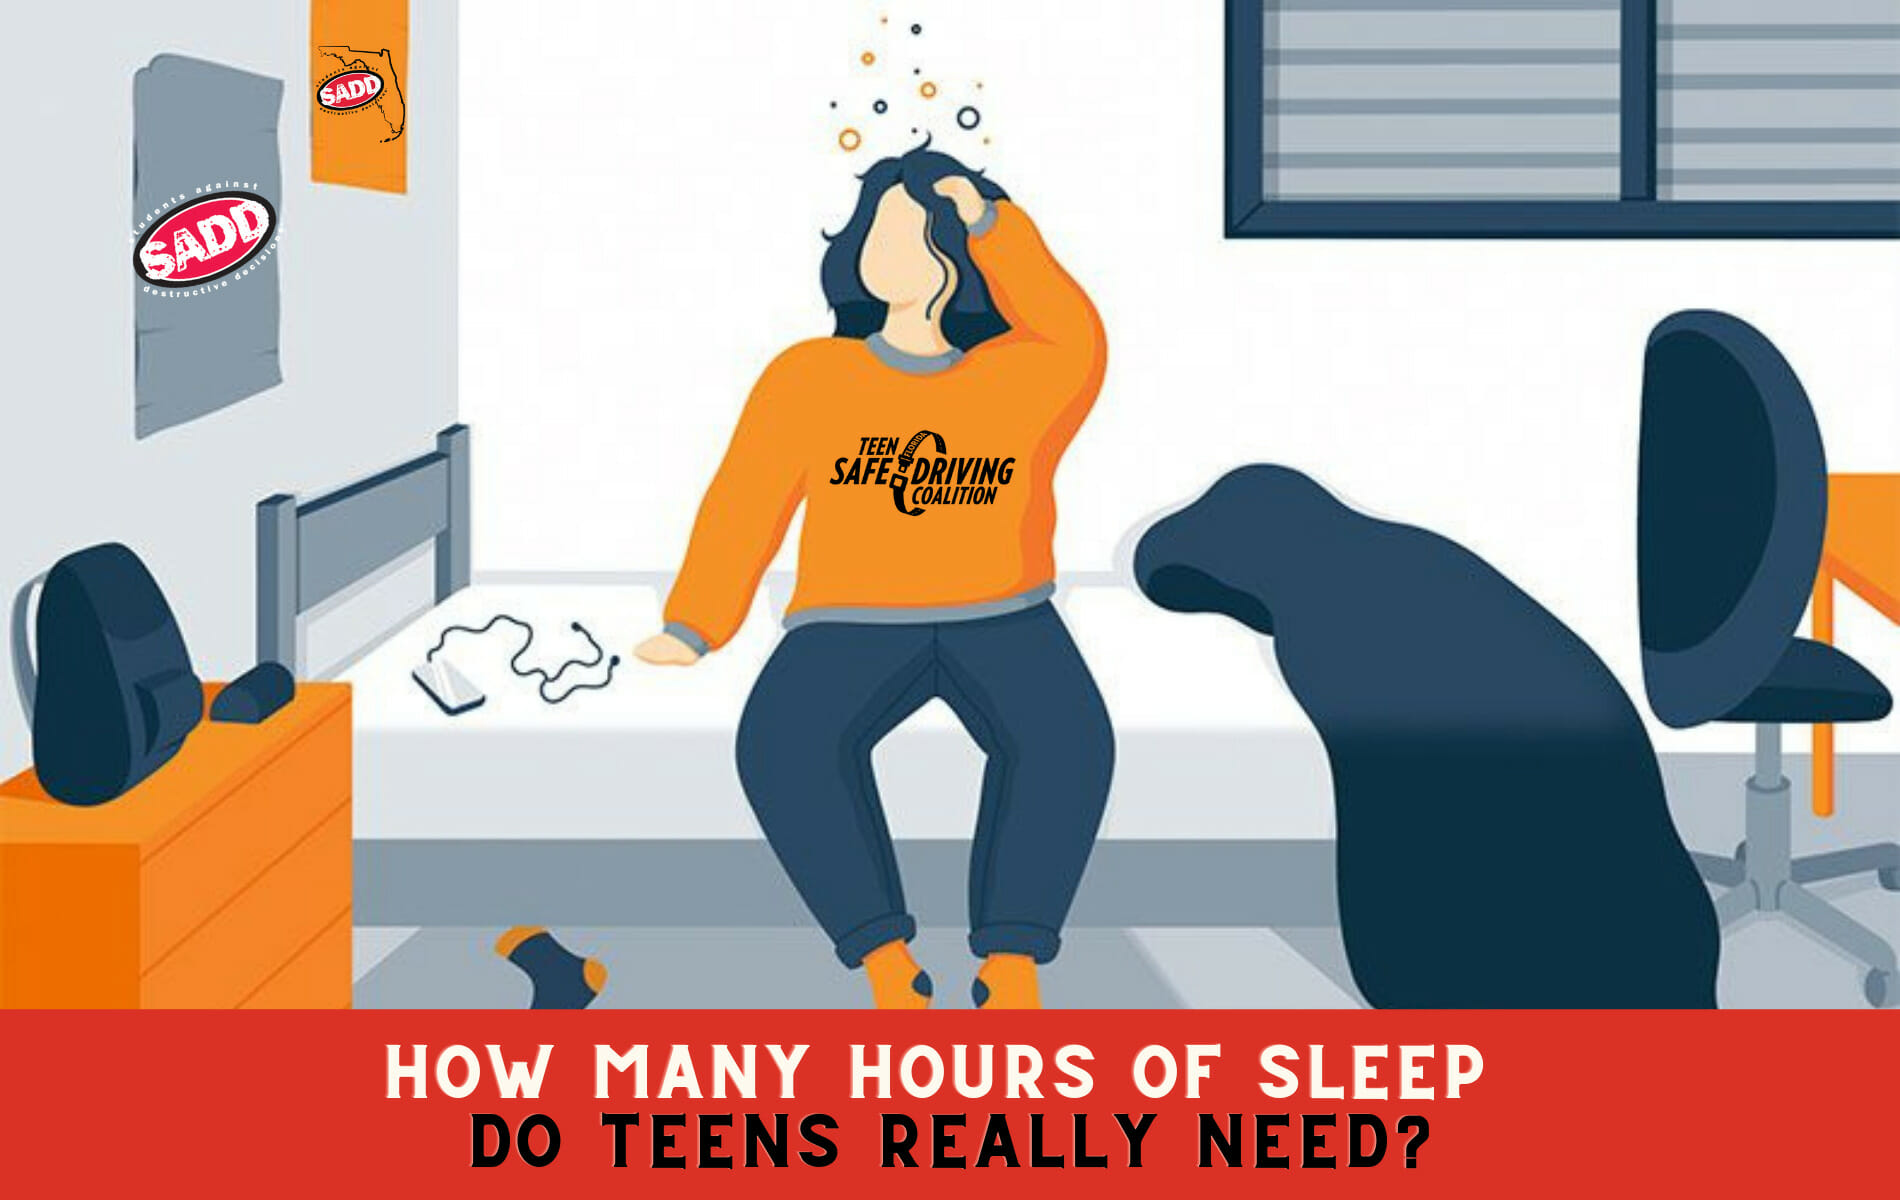 How Many Hours of Sleep Do Teens Really Need?